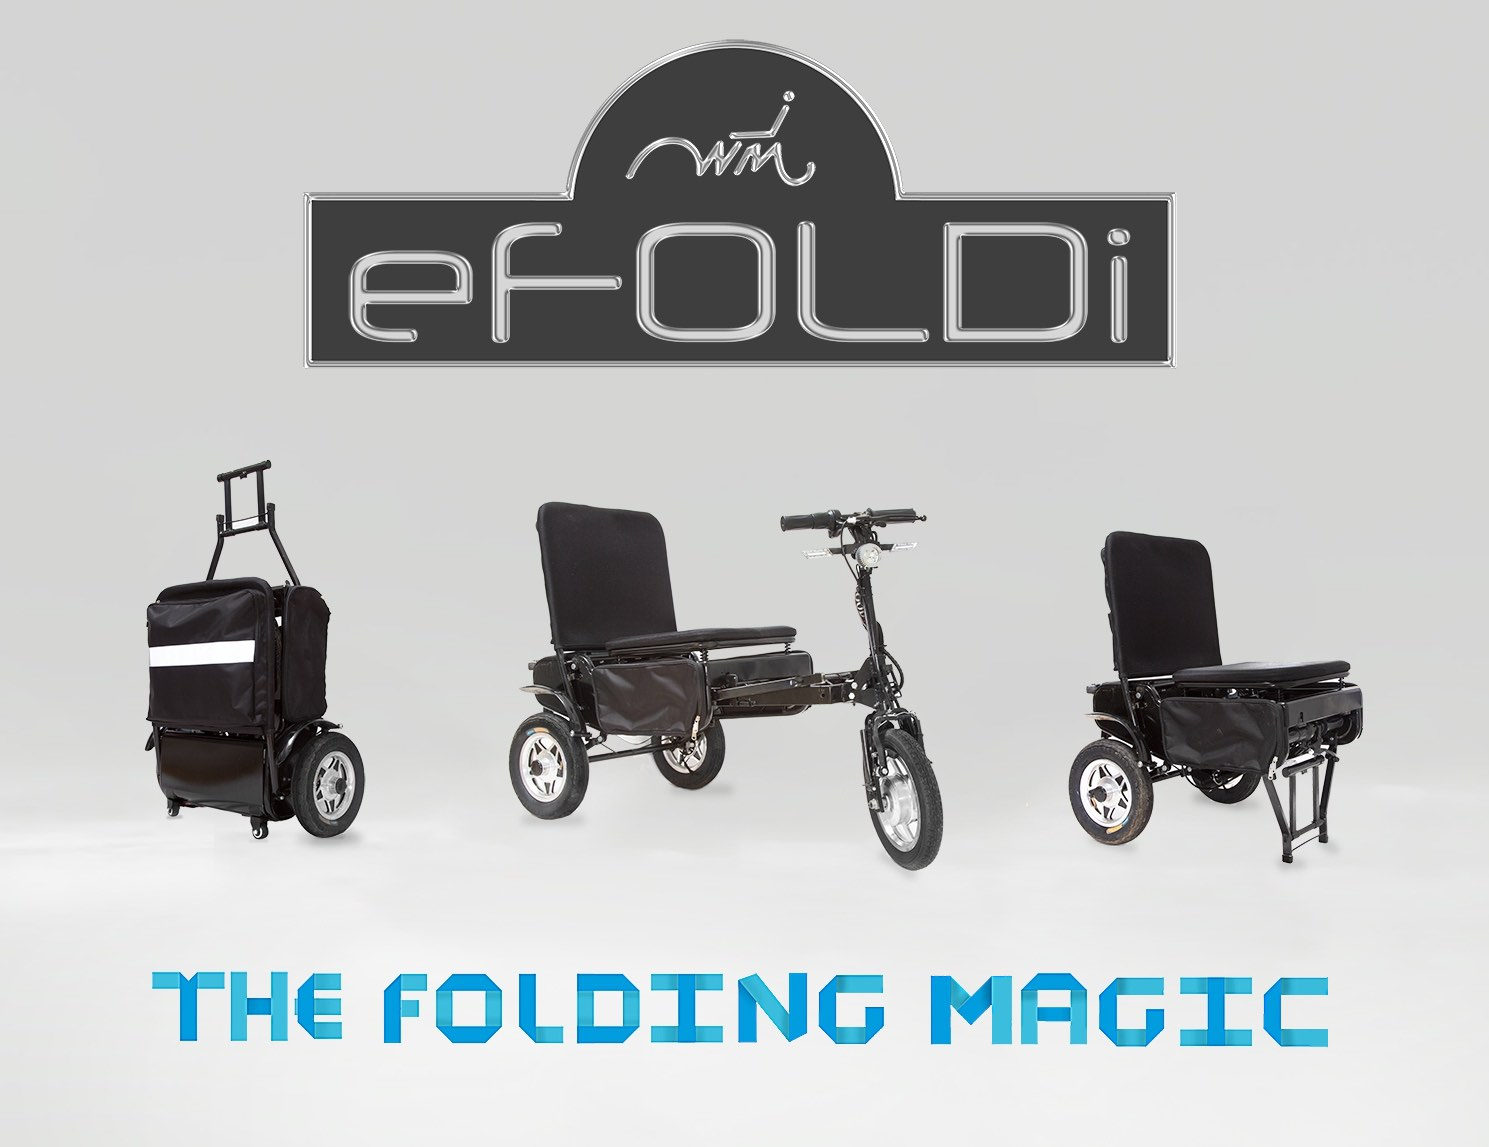 eFOLDi – World Most Versatile Personal Vehicle